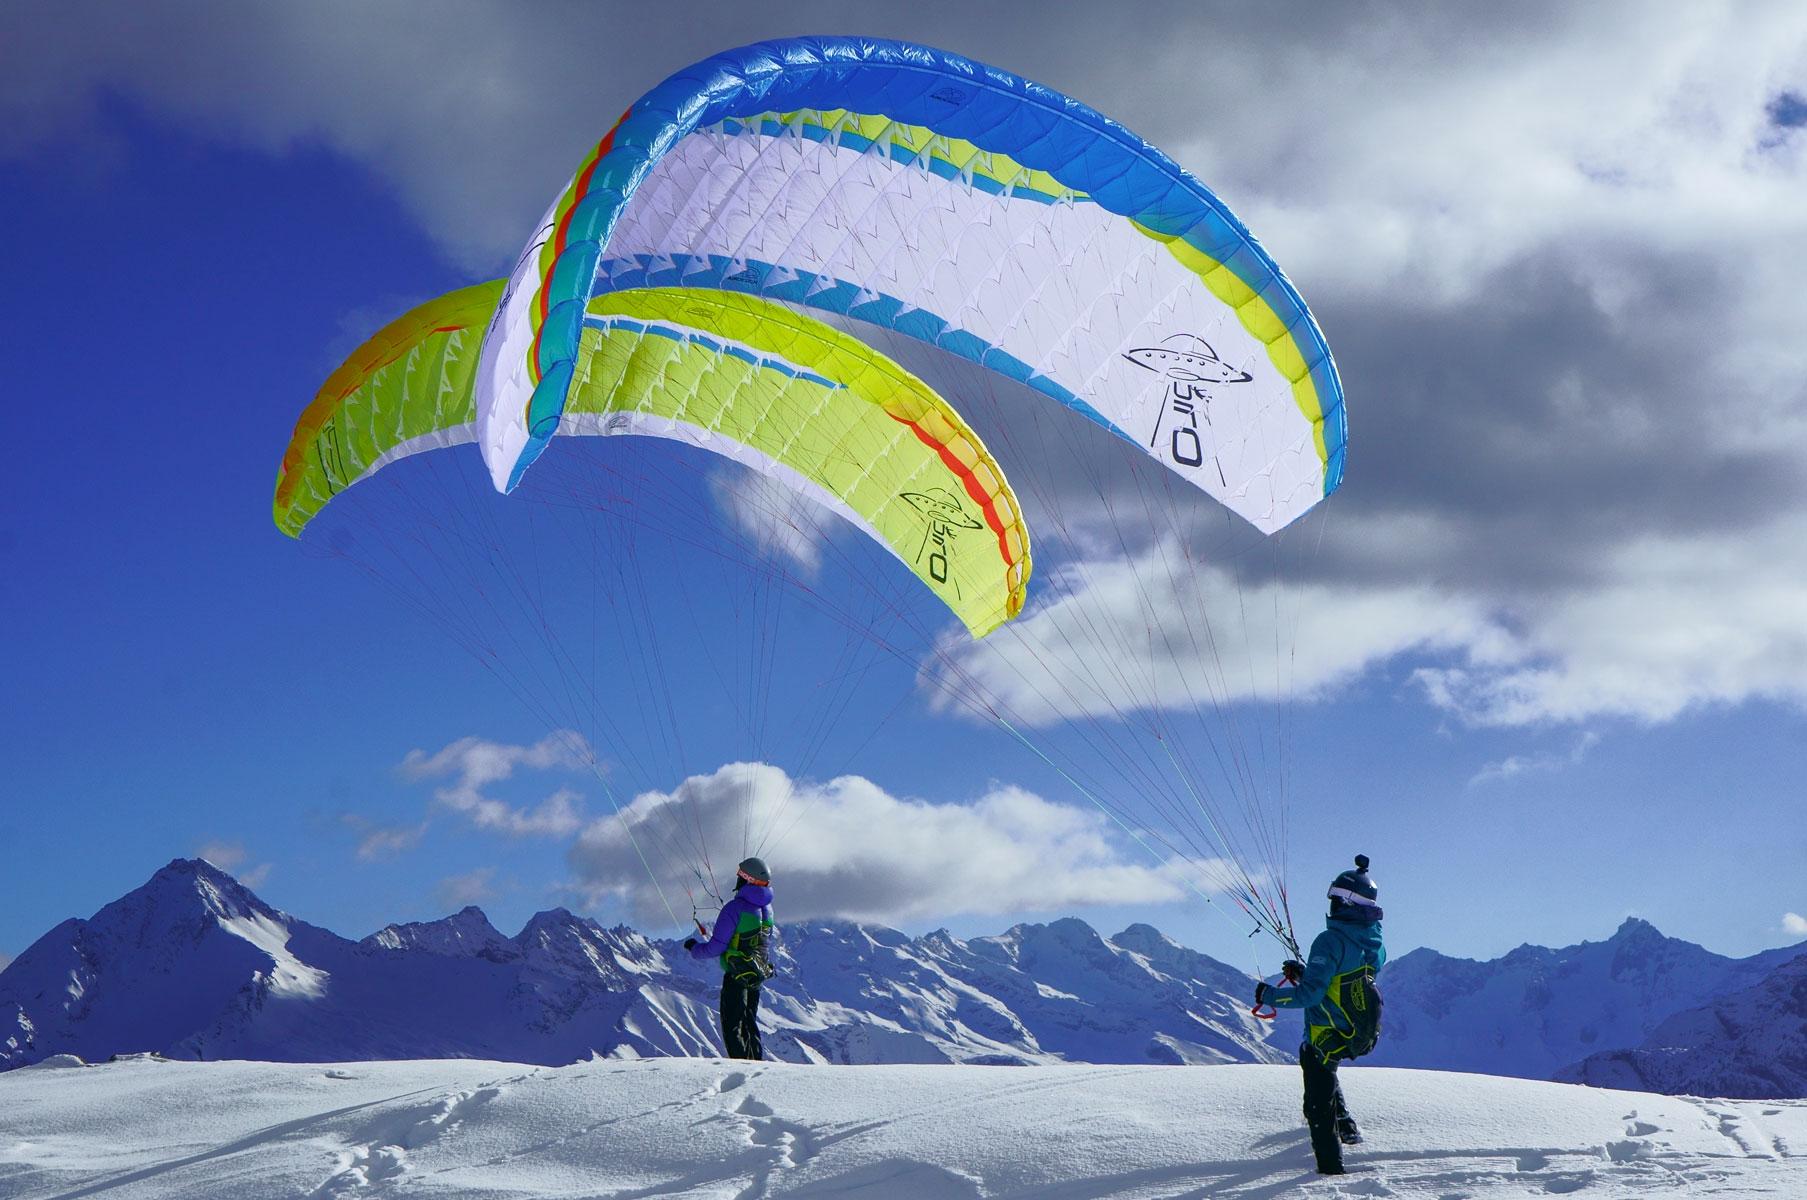 UFO-Air-design-winter